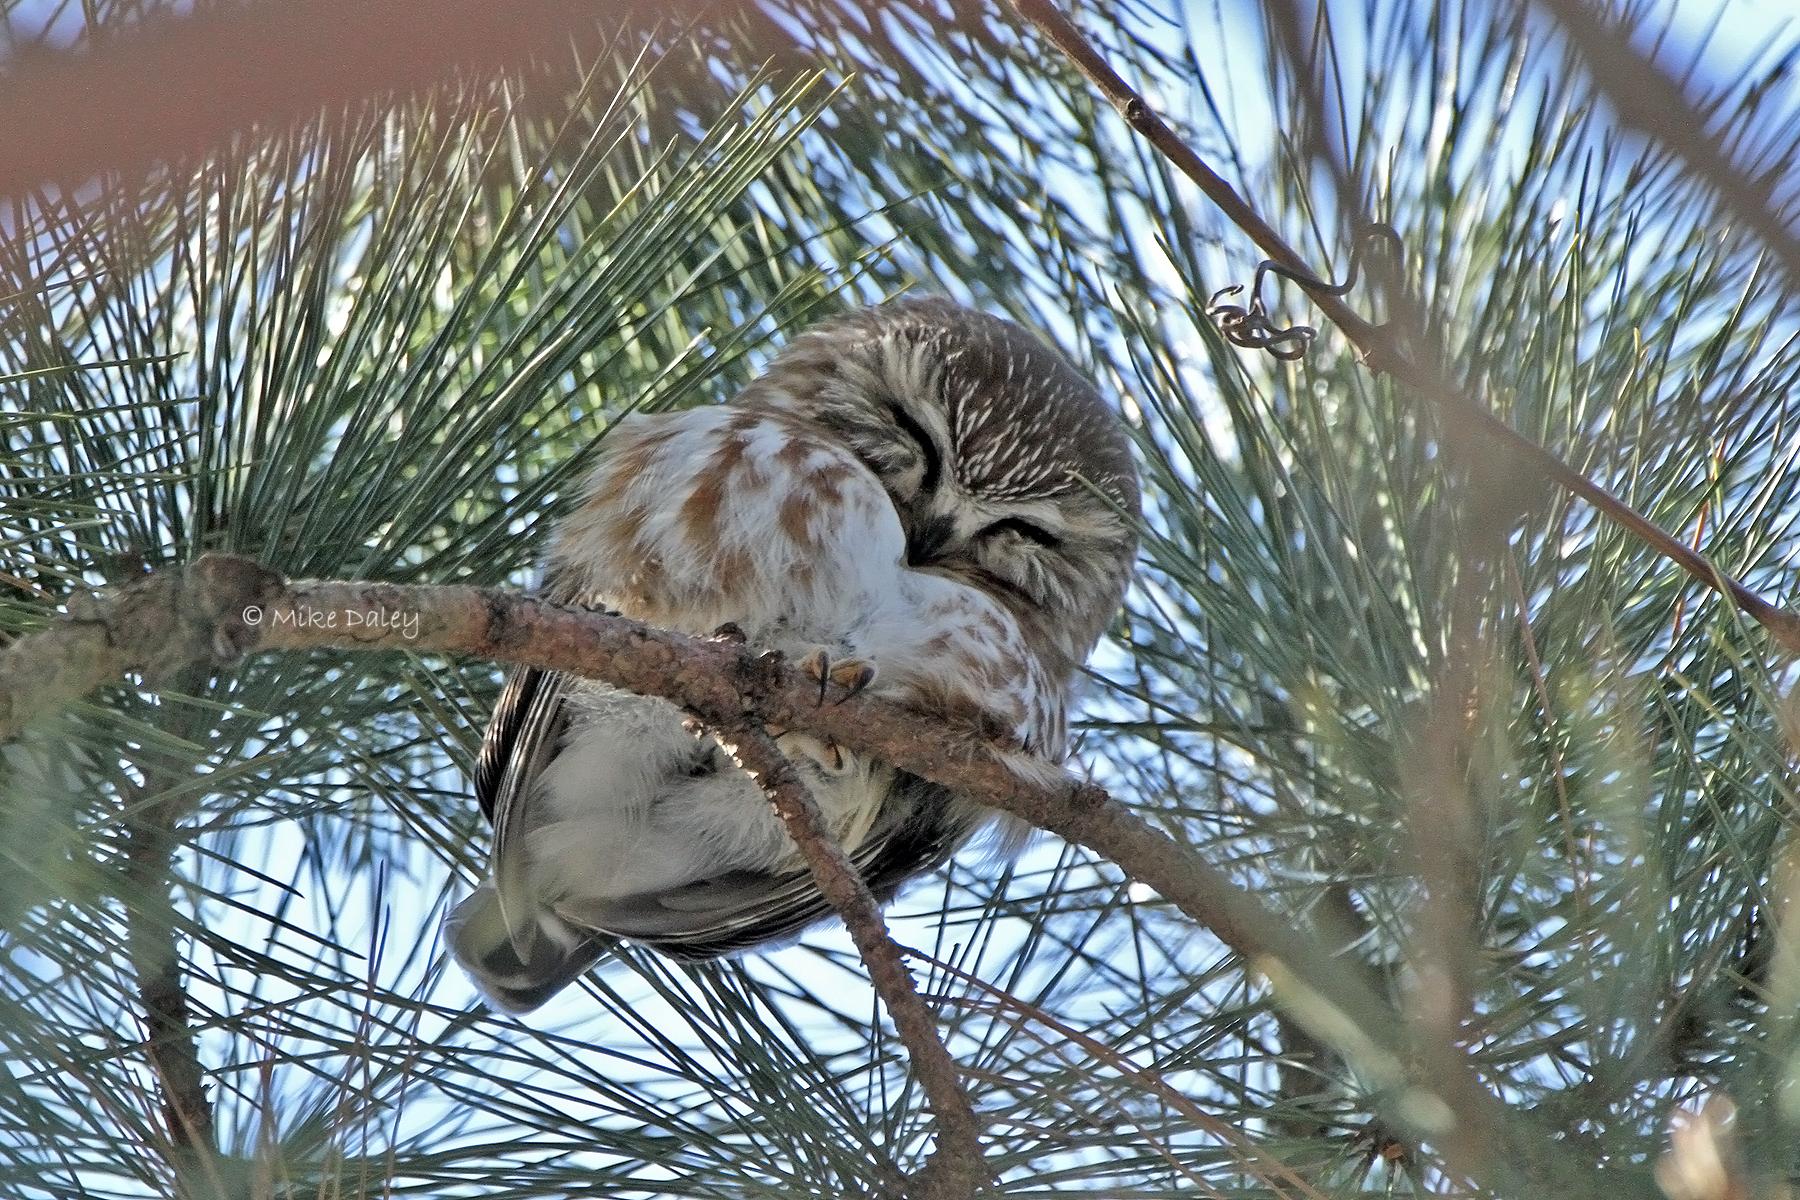 Innovative screens help save tiny western owls